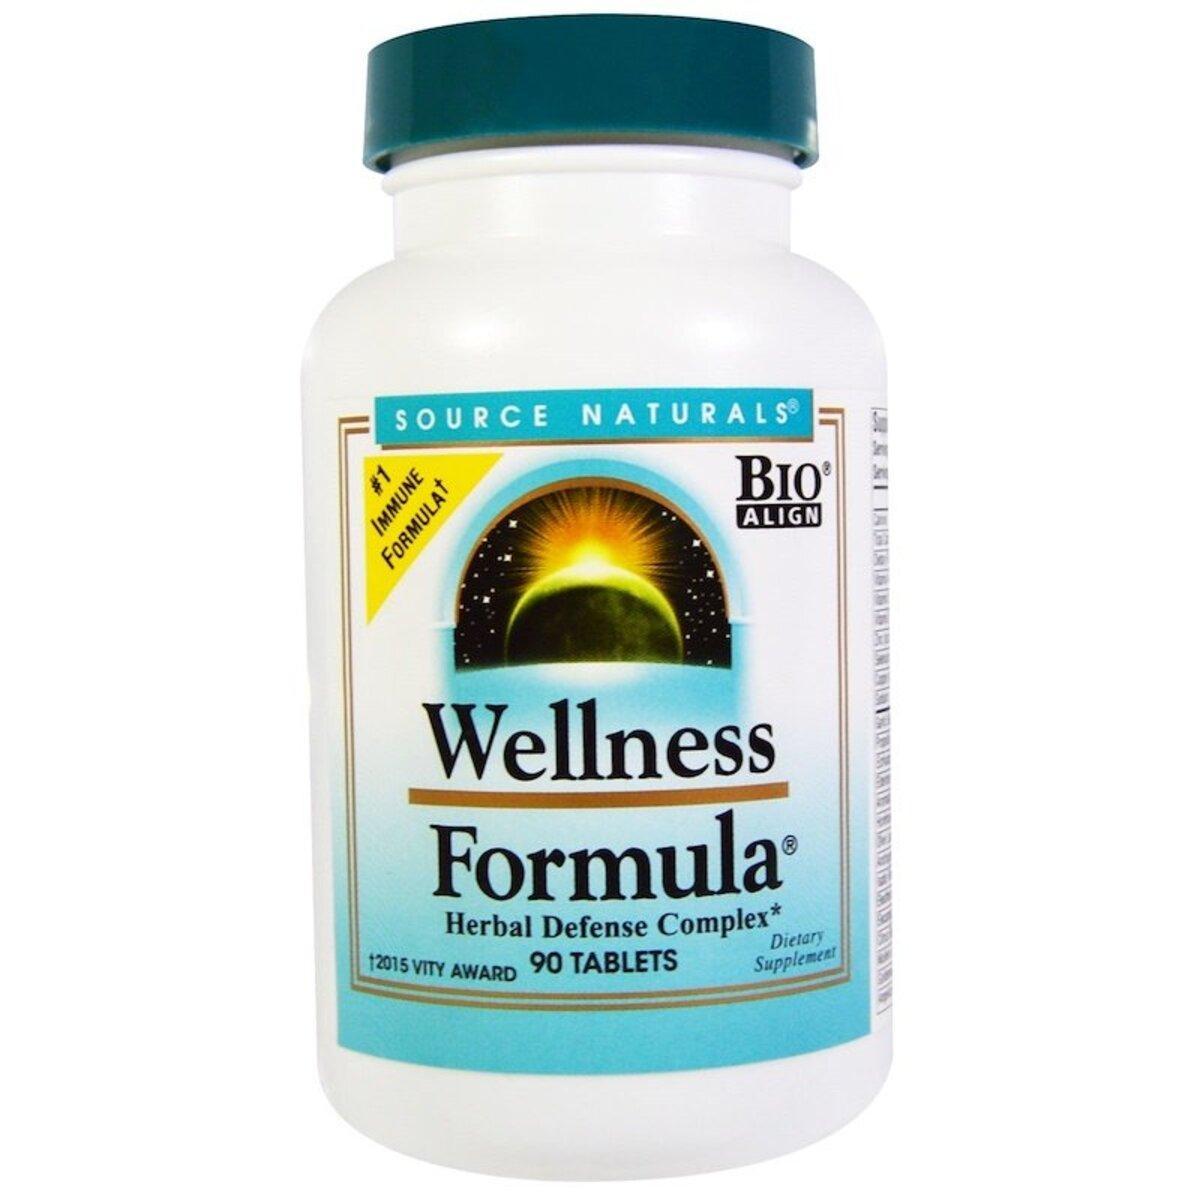 Комплекс лечебных трав, Wellness Formula, Source Naturals, 90 таблеток